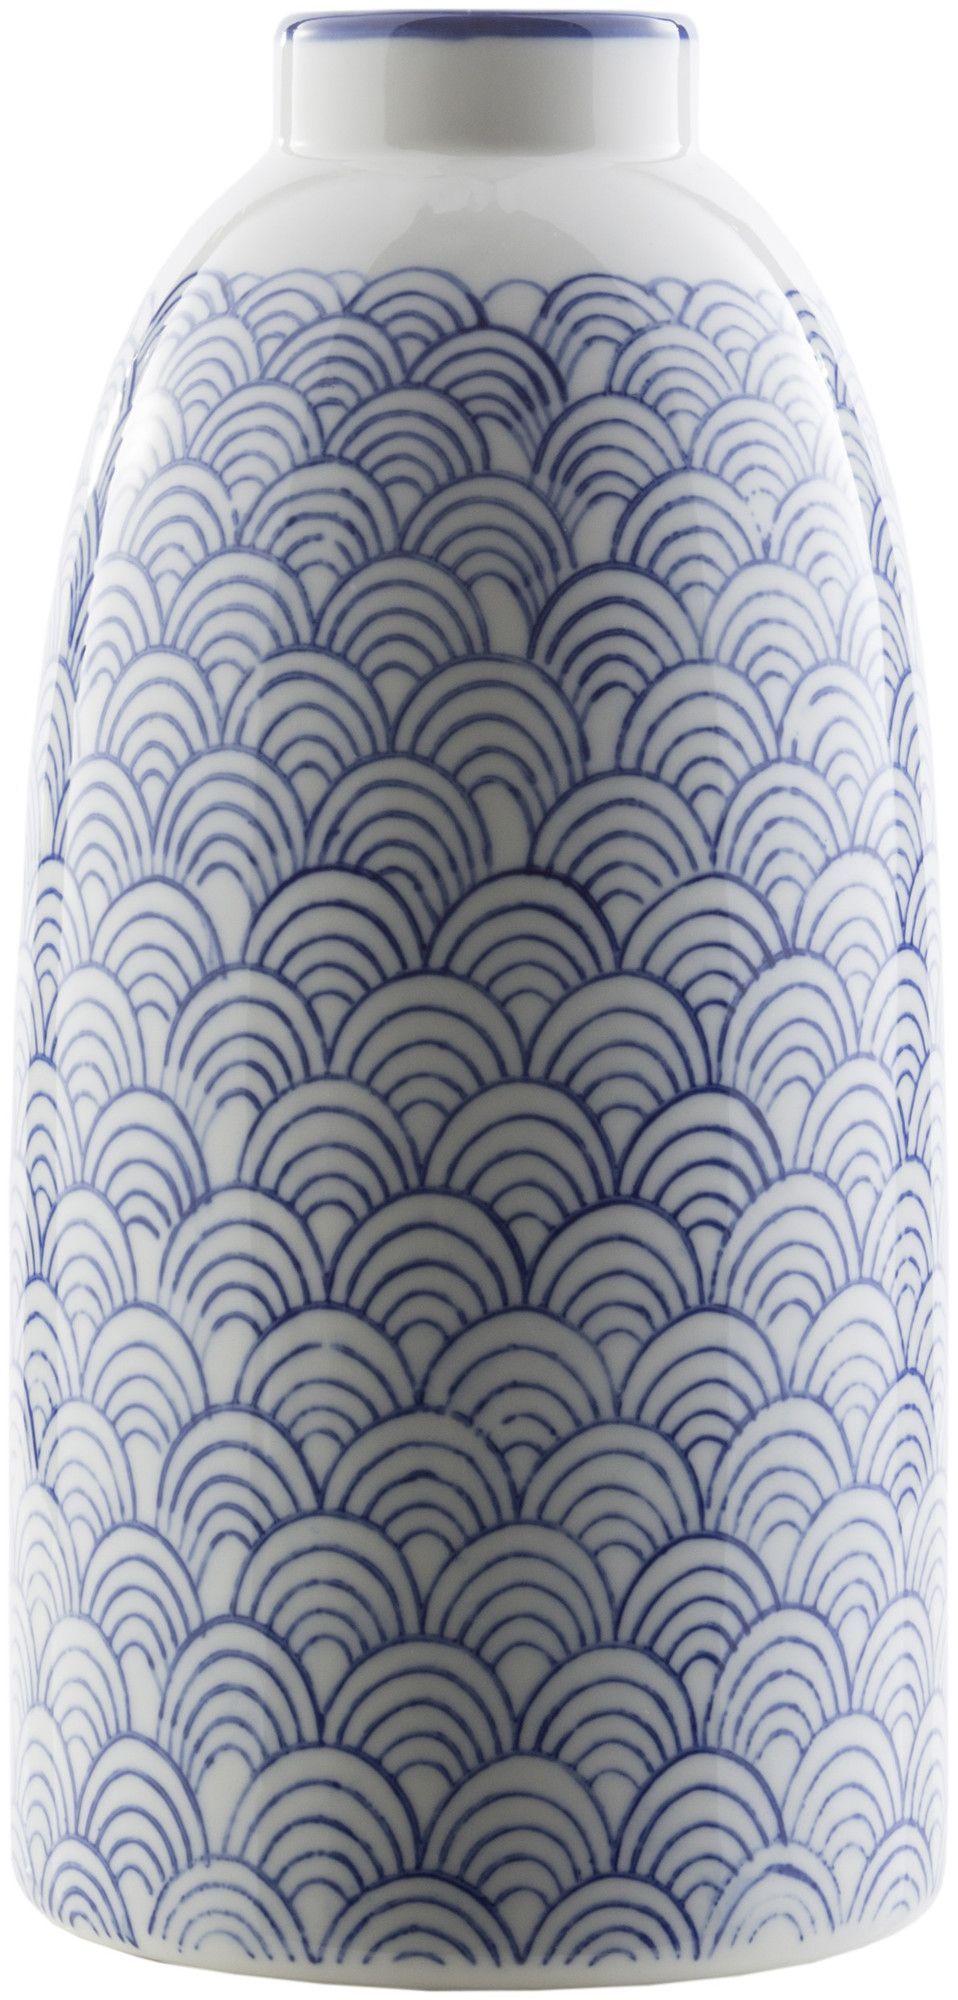 Herlev Table Vase